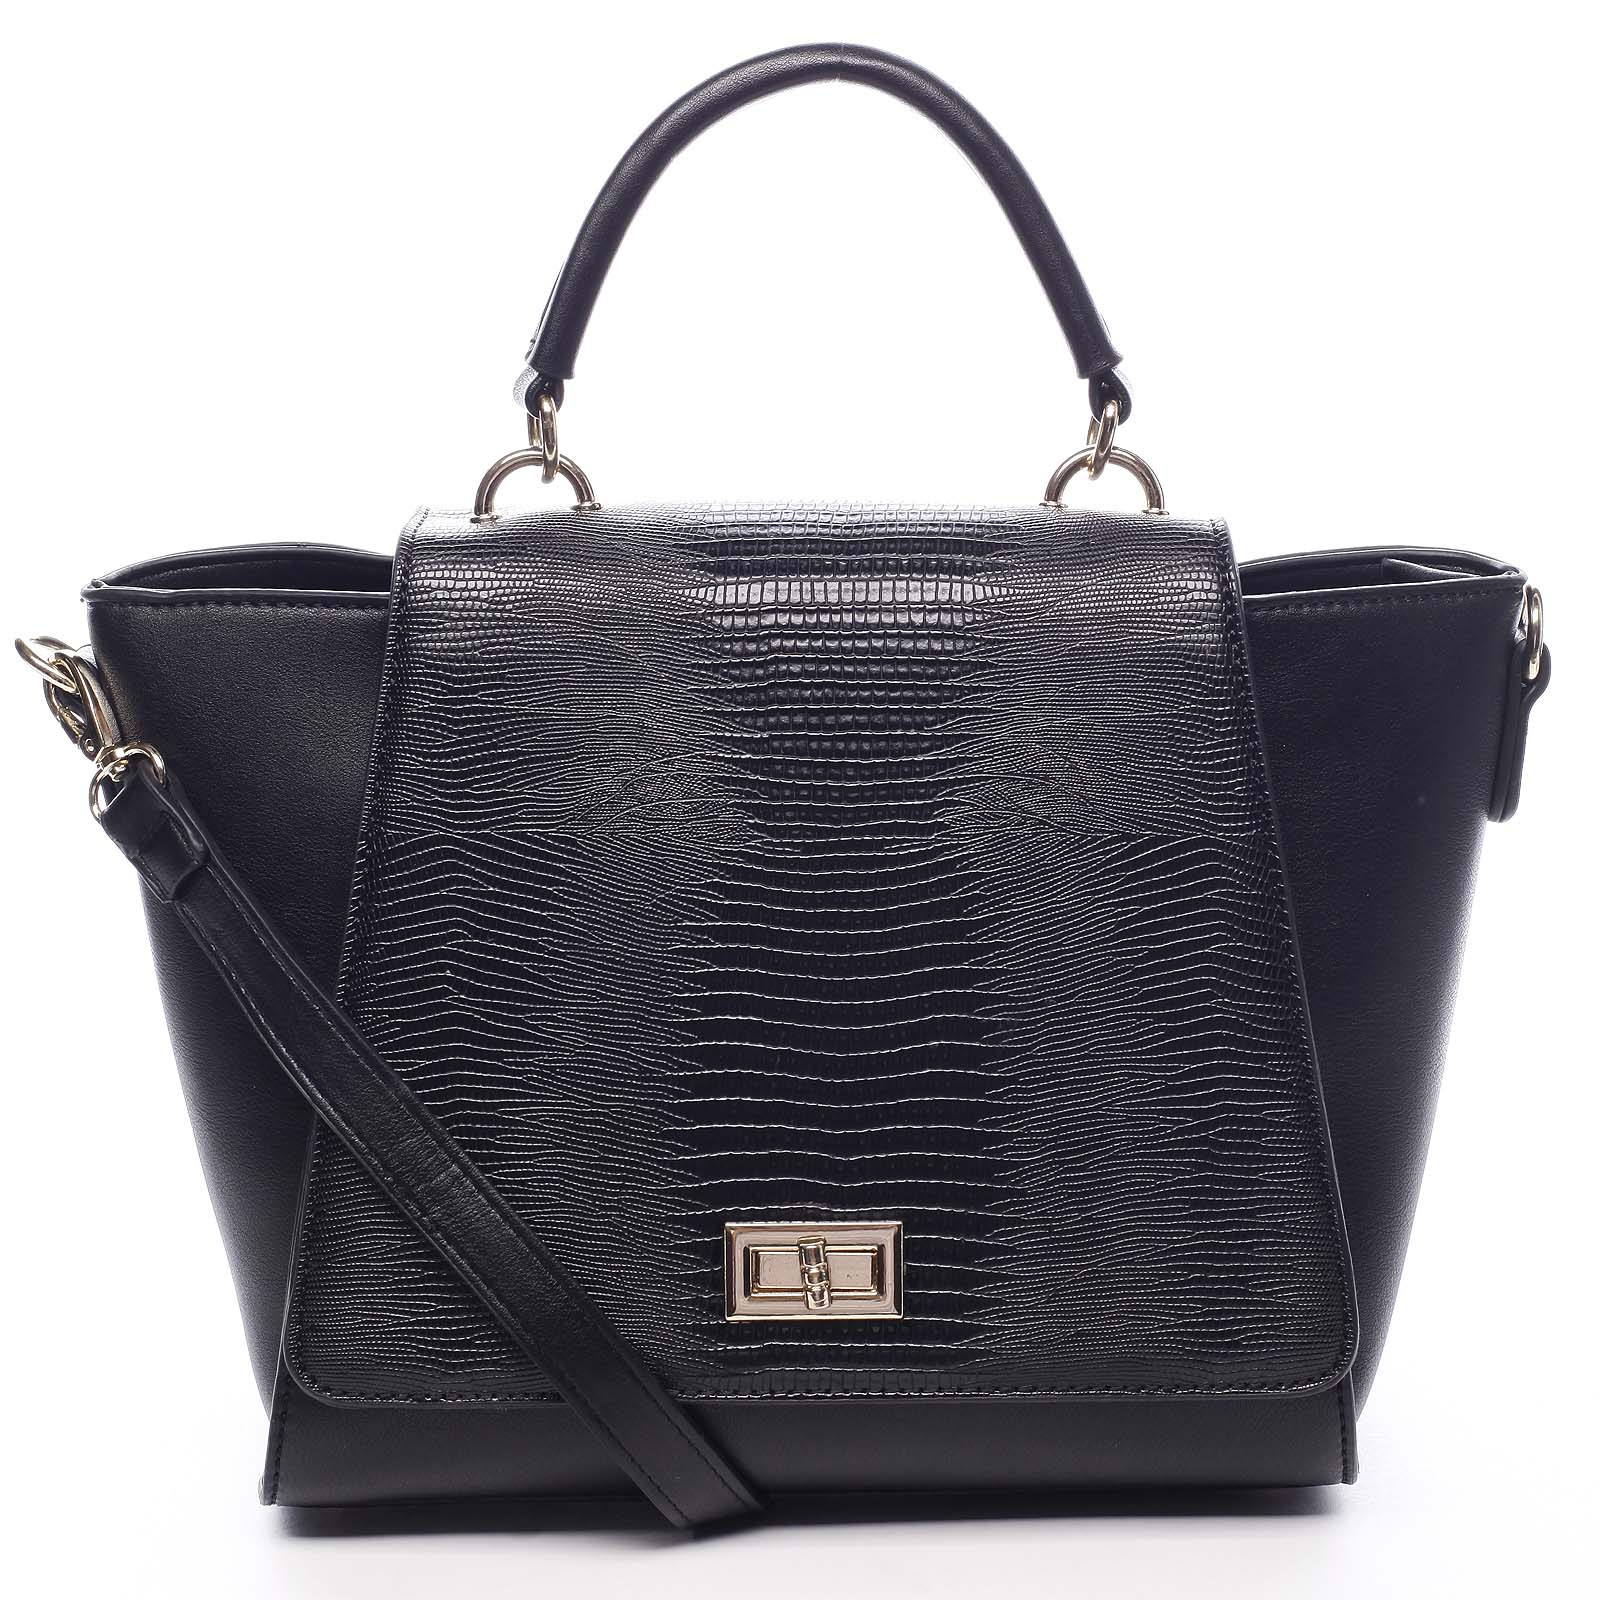 Dámska kabelka do ruky čierna - Dudlin Mirla čierna